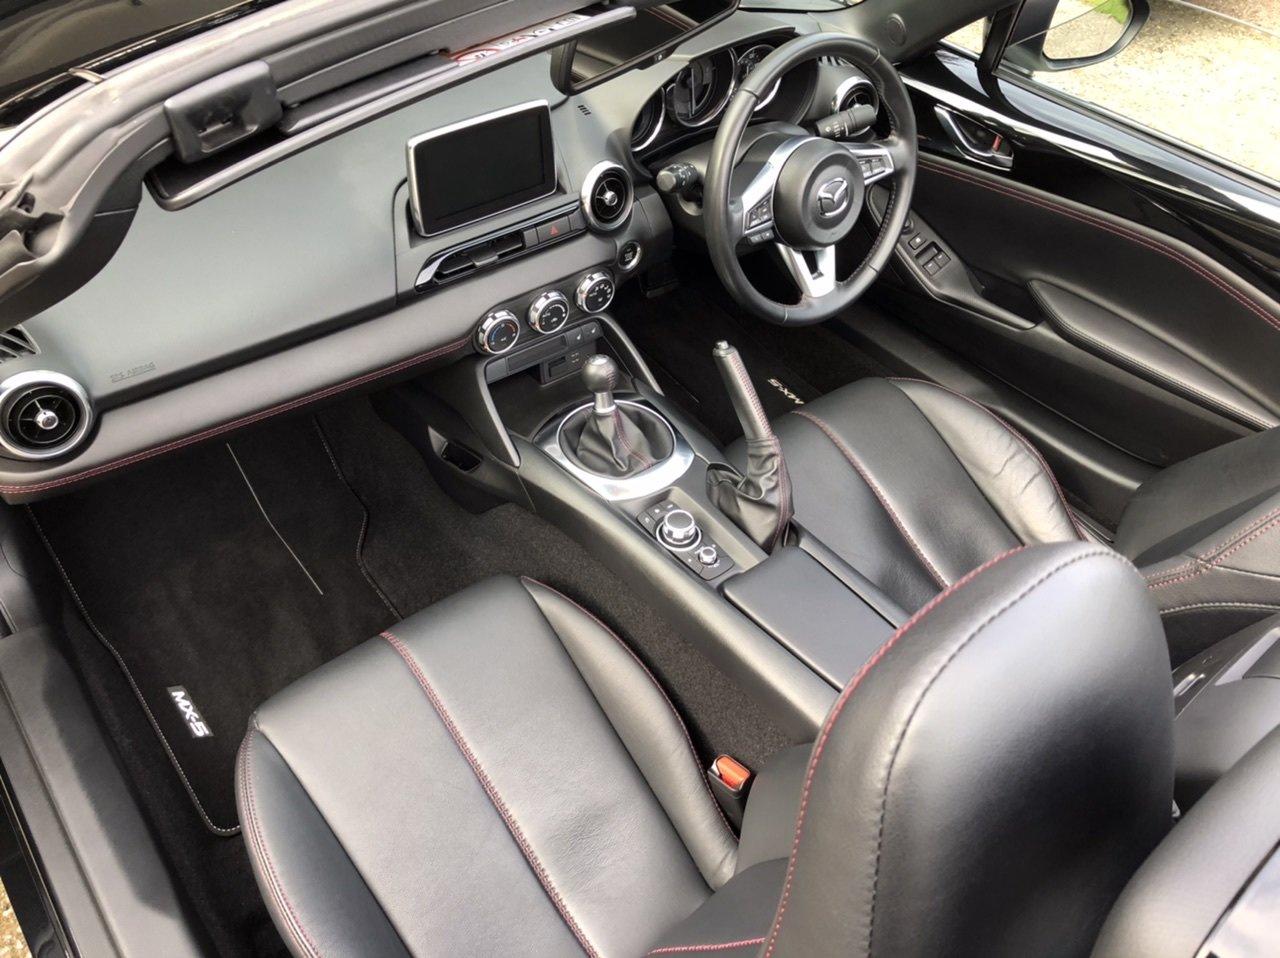 2018 Mazda MX-5 Sport Nav  For Sale (picture 4 of 6)